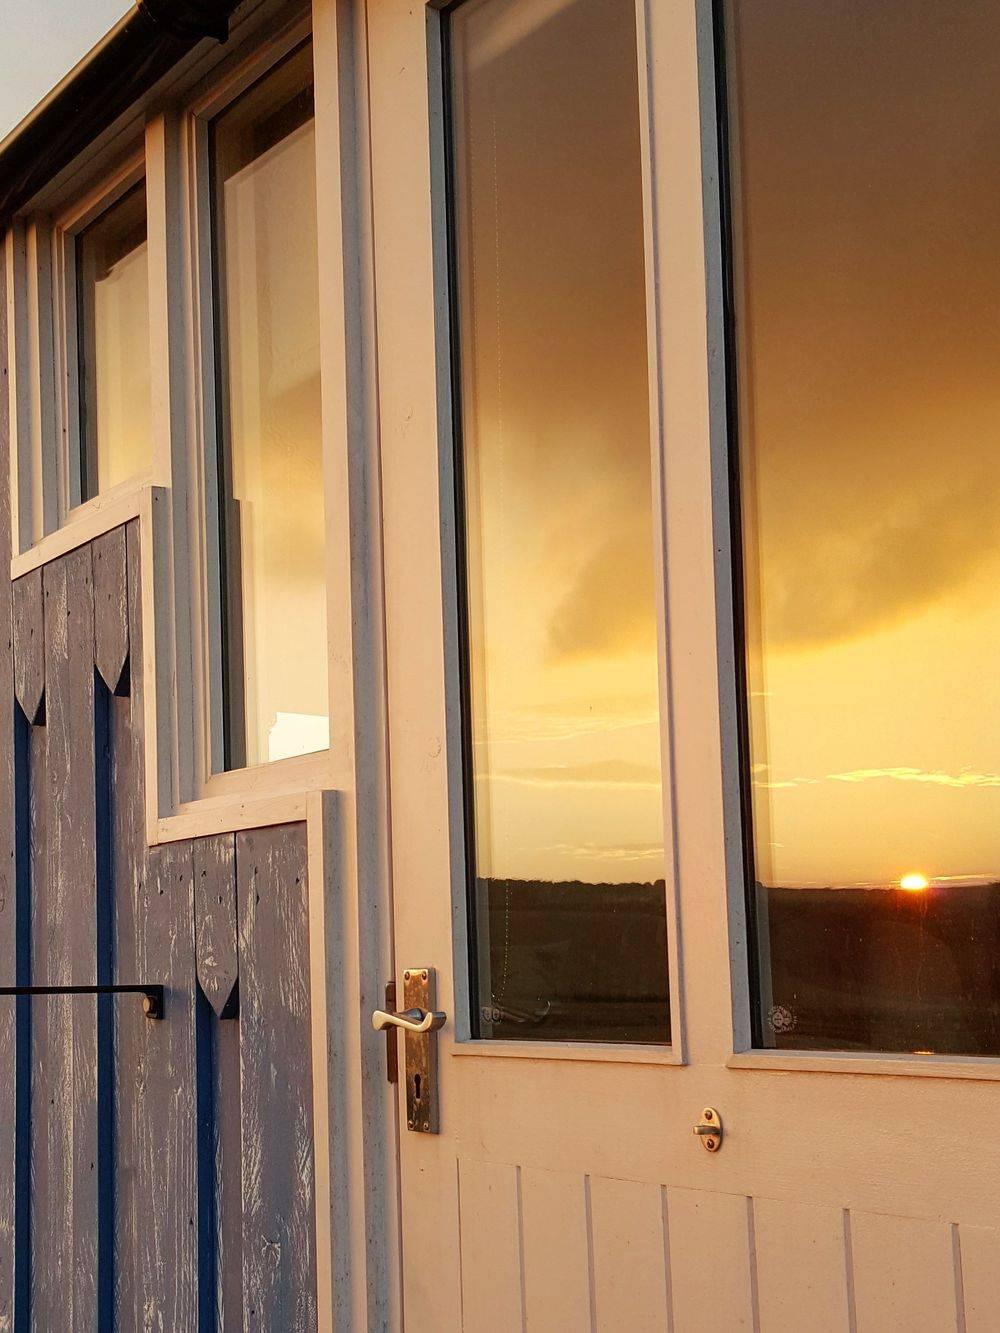 Quriky Hut Windows